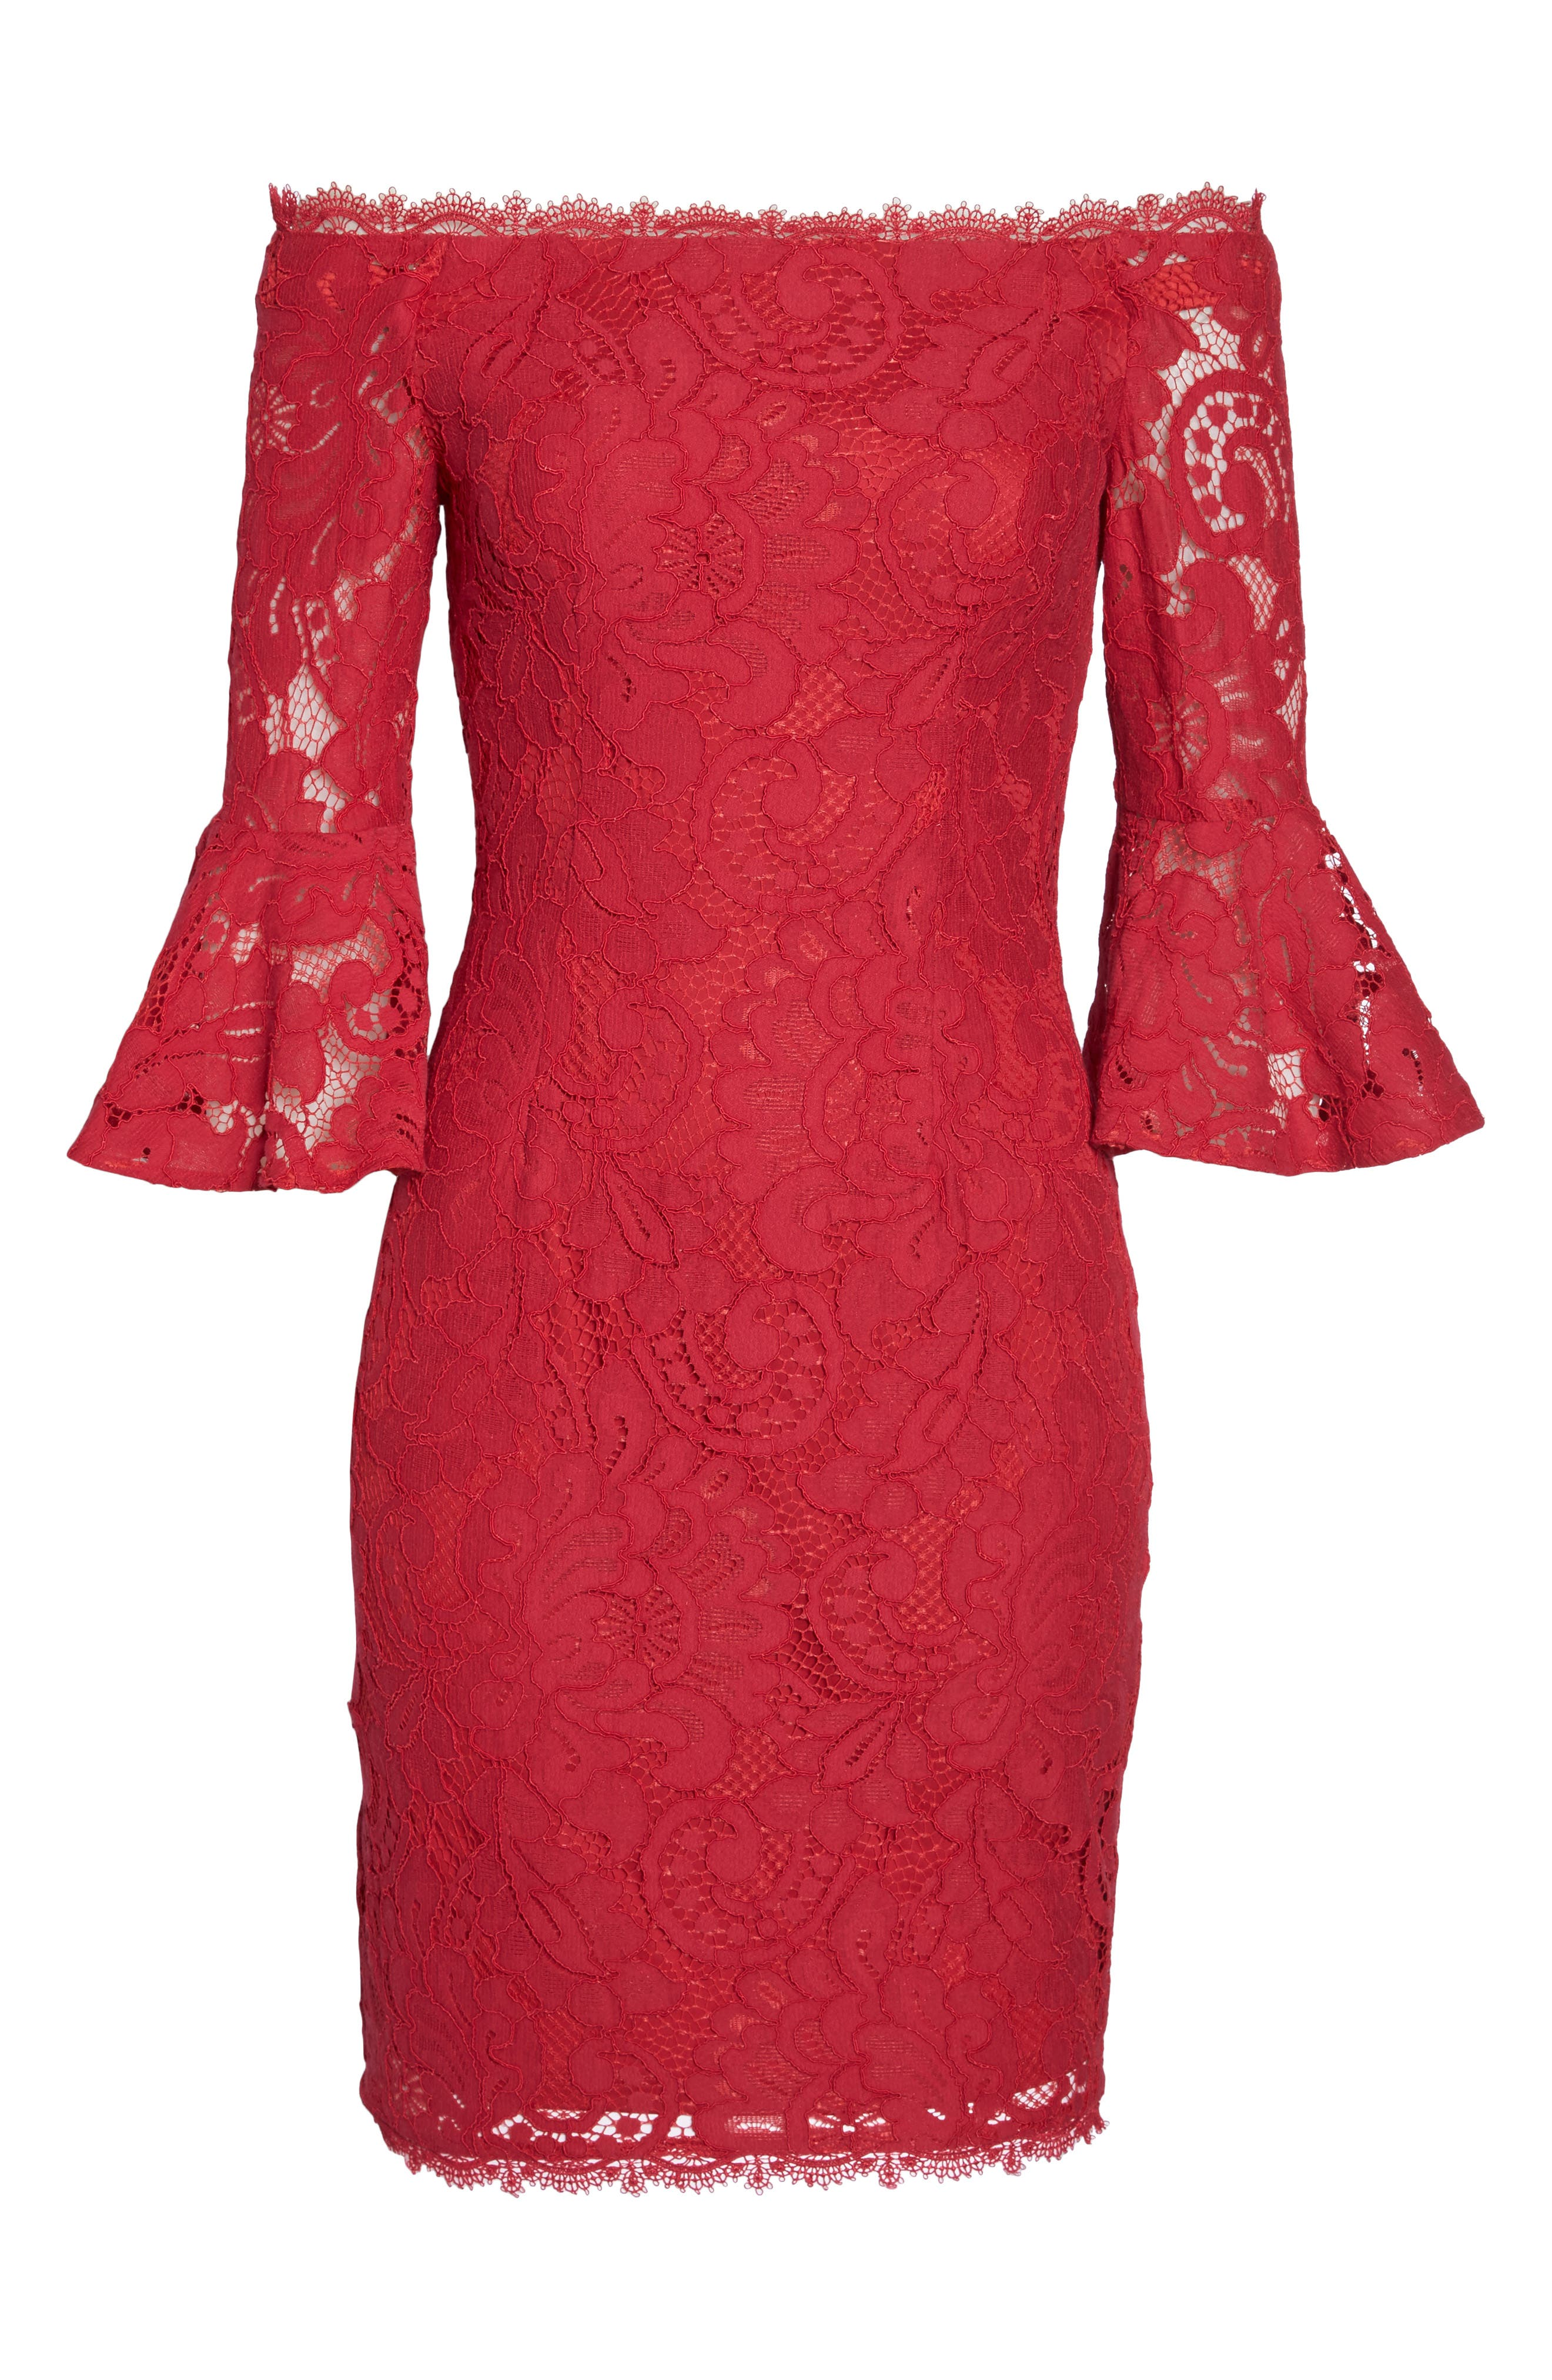 Off the Shoulder Lace Sheath Dress,                             Alternate thumbnail 7, color,                             620